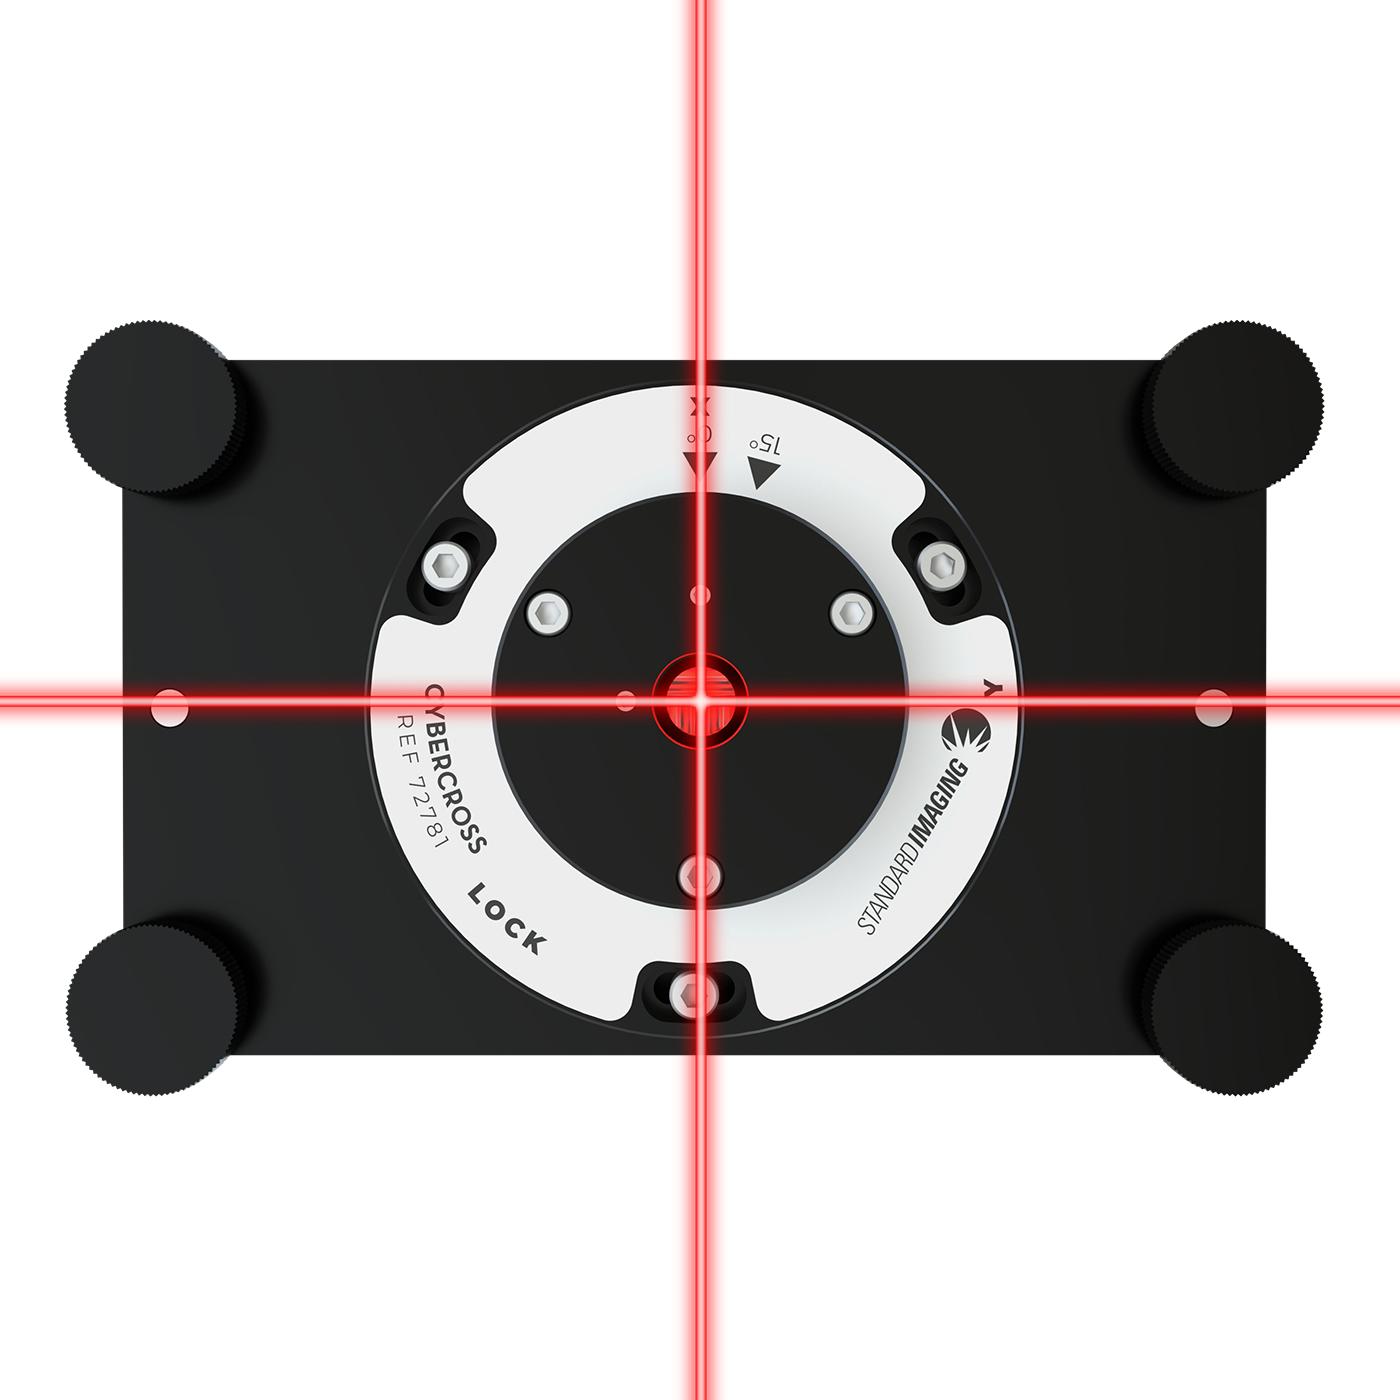 Cybercross feature dtb 1400